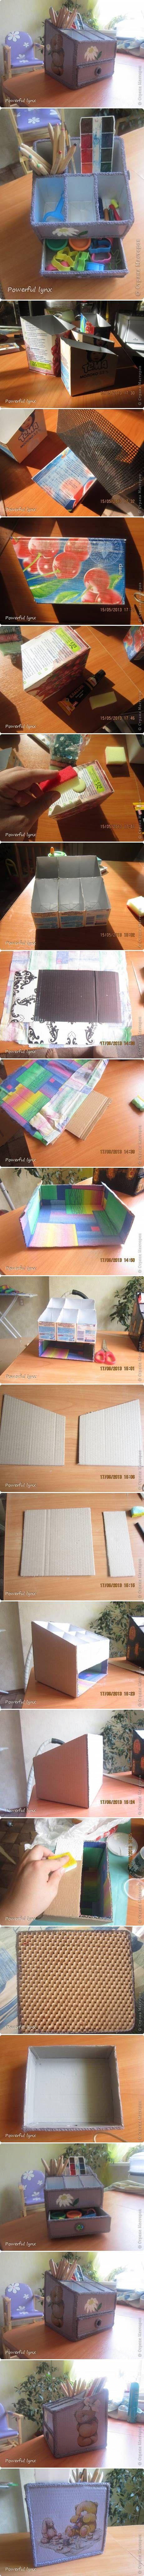 DIY Beautiful Desk Organizer DIY Beautiful Desk Organizer